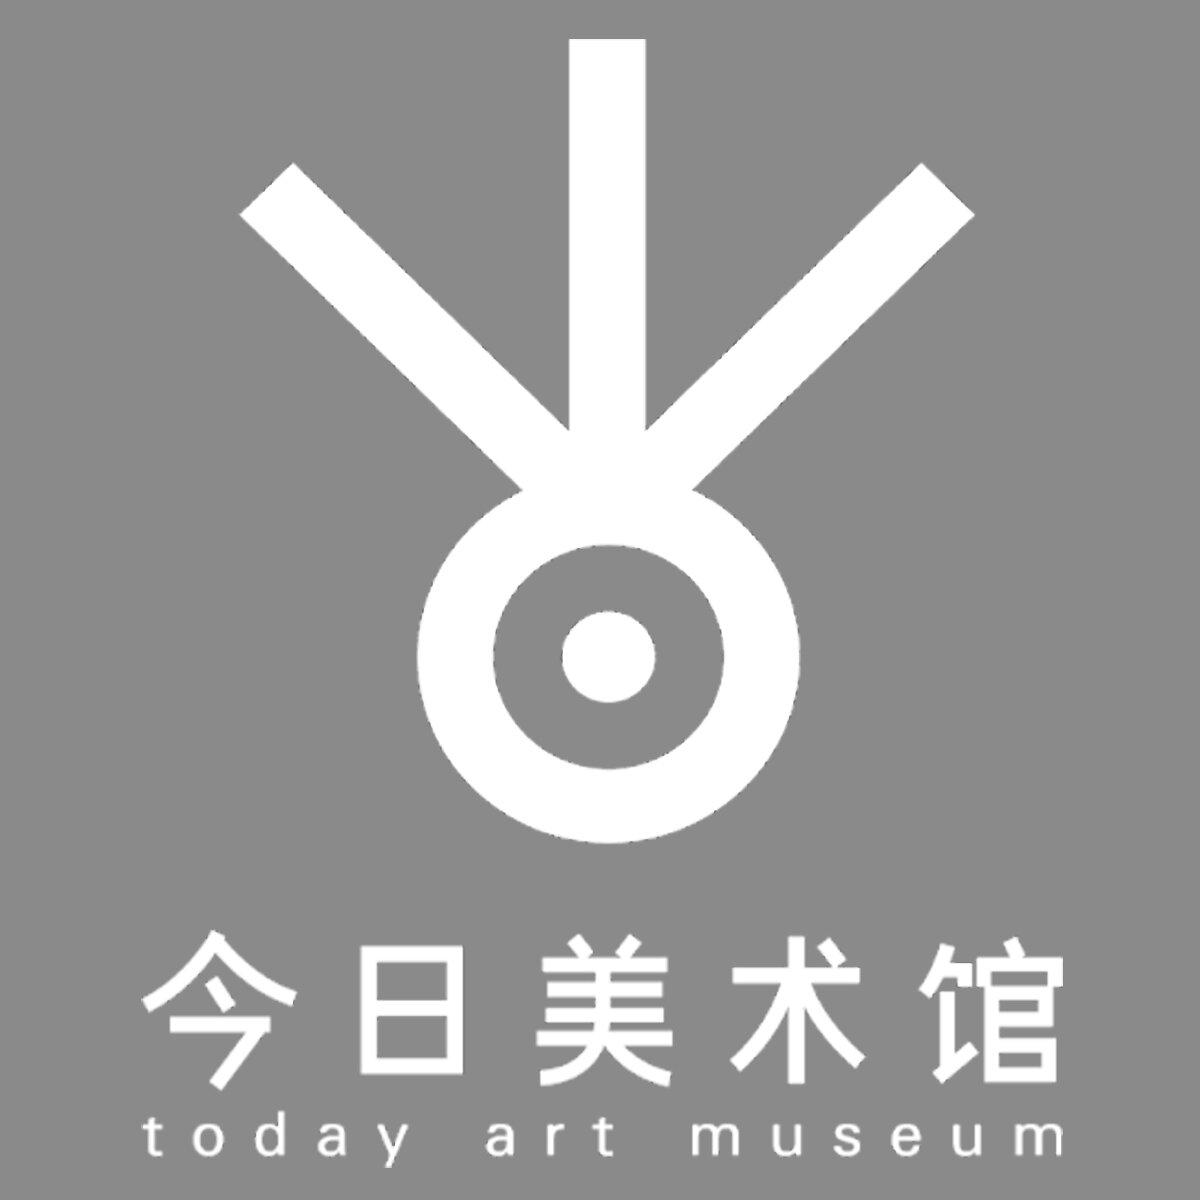 SQUARE-Today-Art-Museum-logo-Chinese-BW.jpg